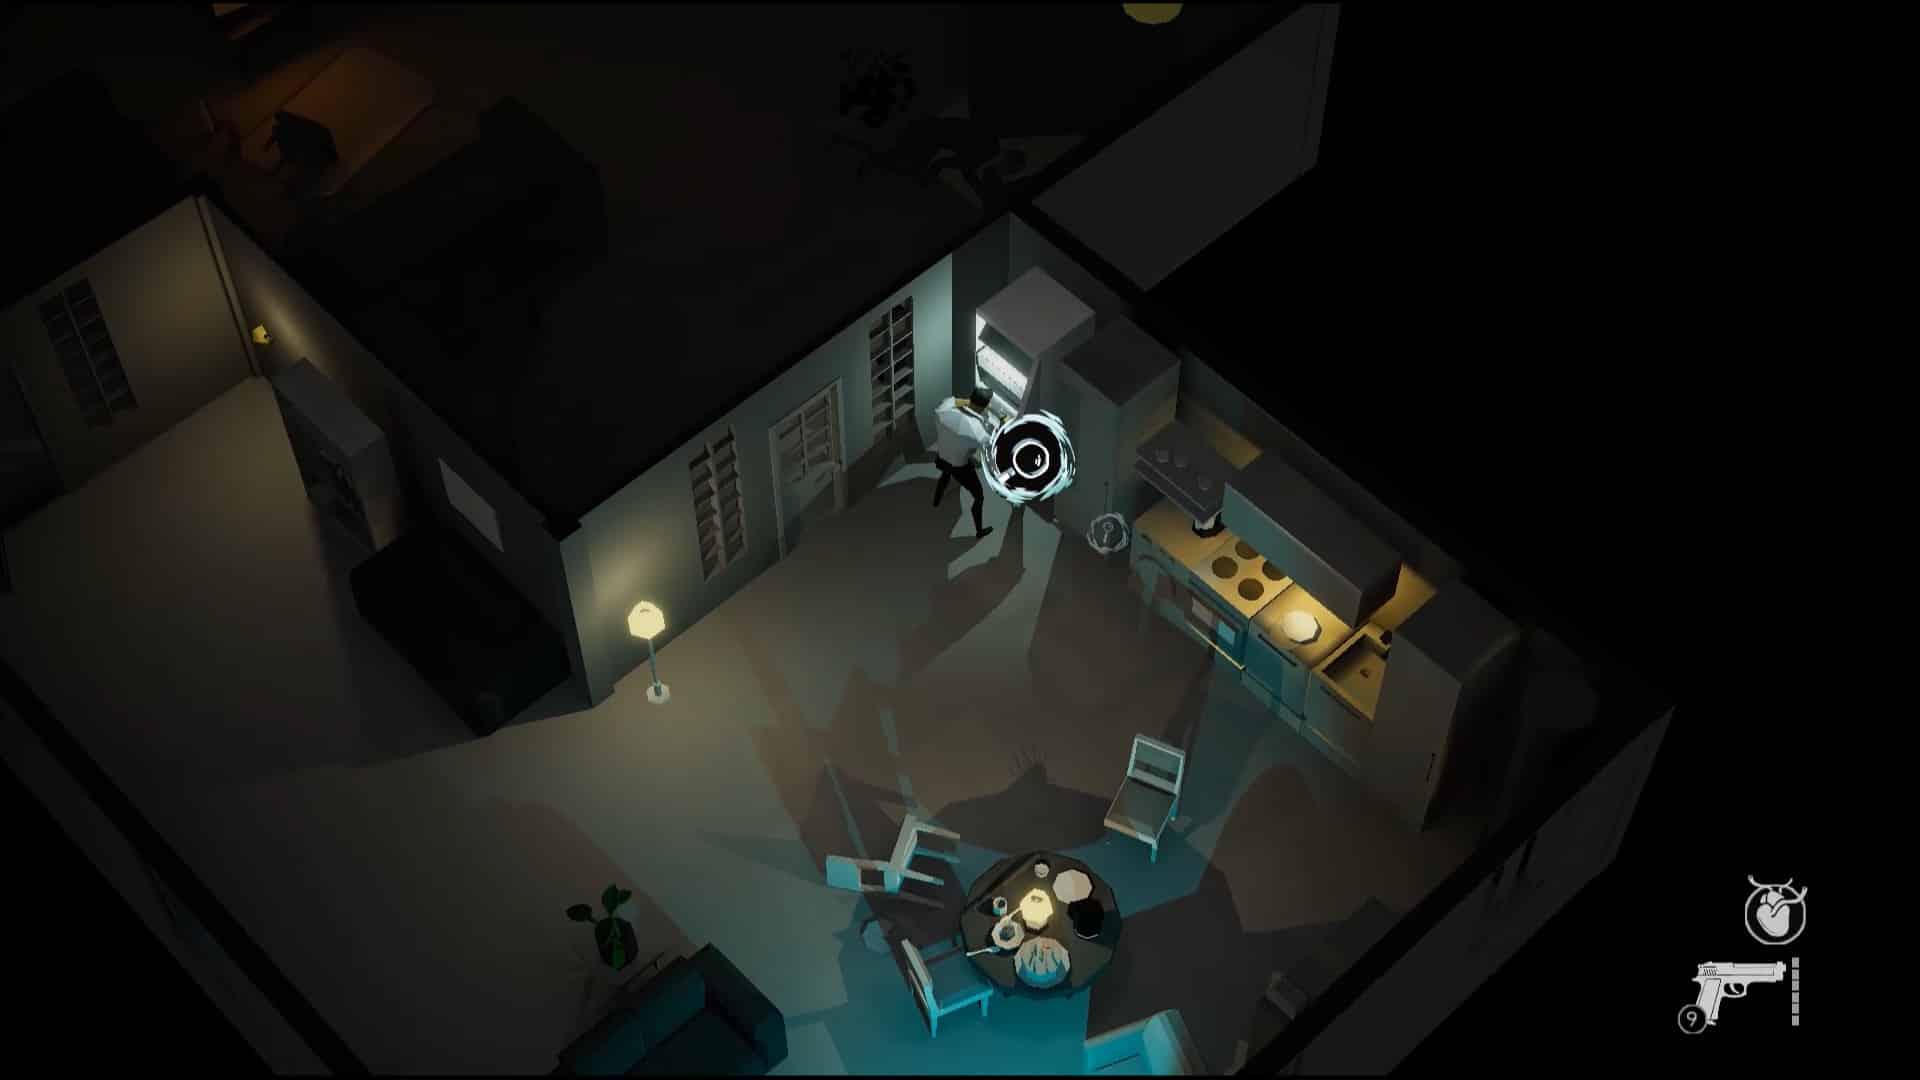 skyhill black mist game screenshot wallpaper 71611